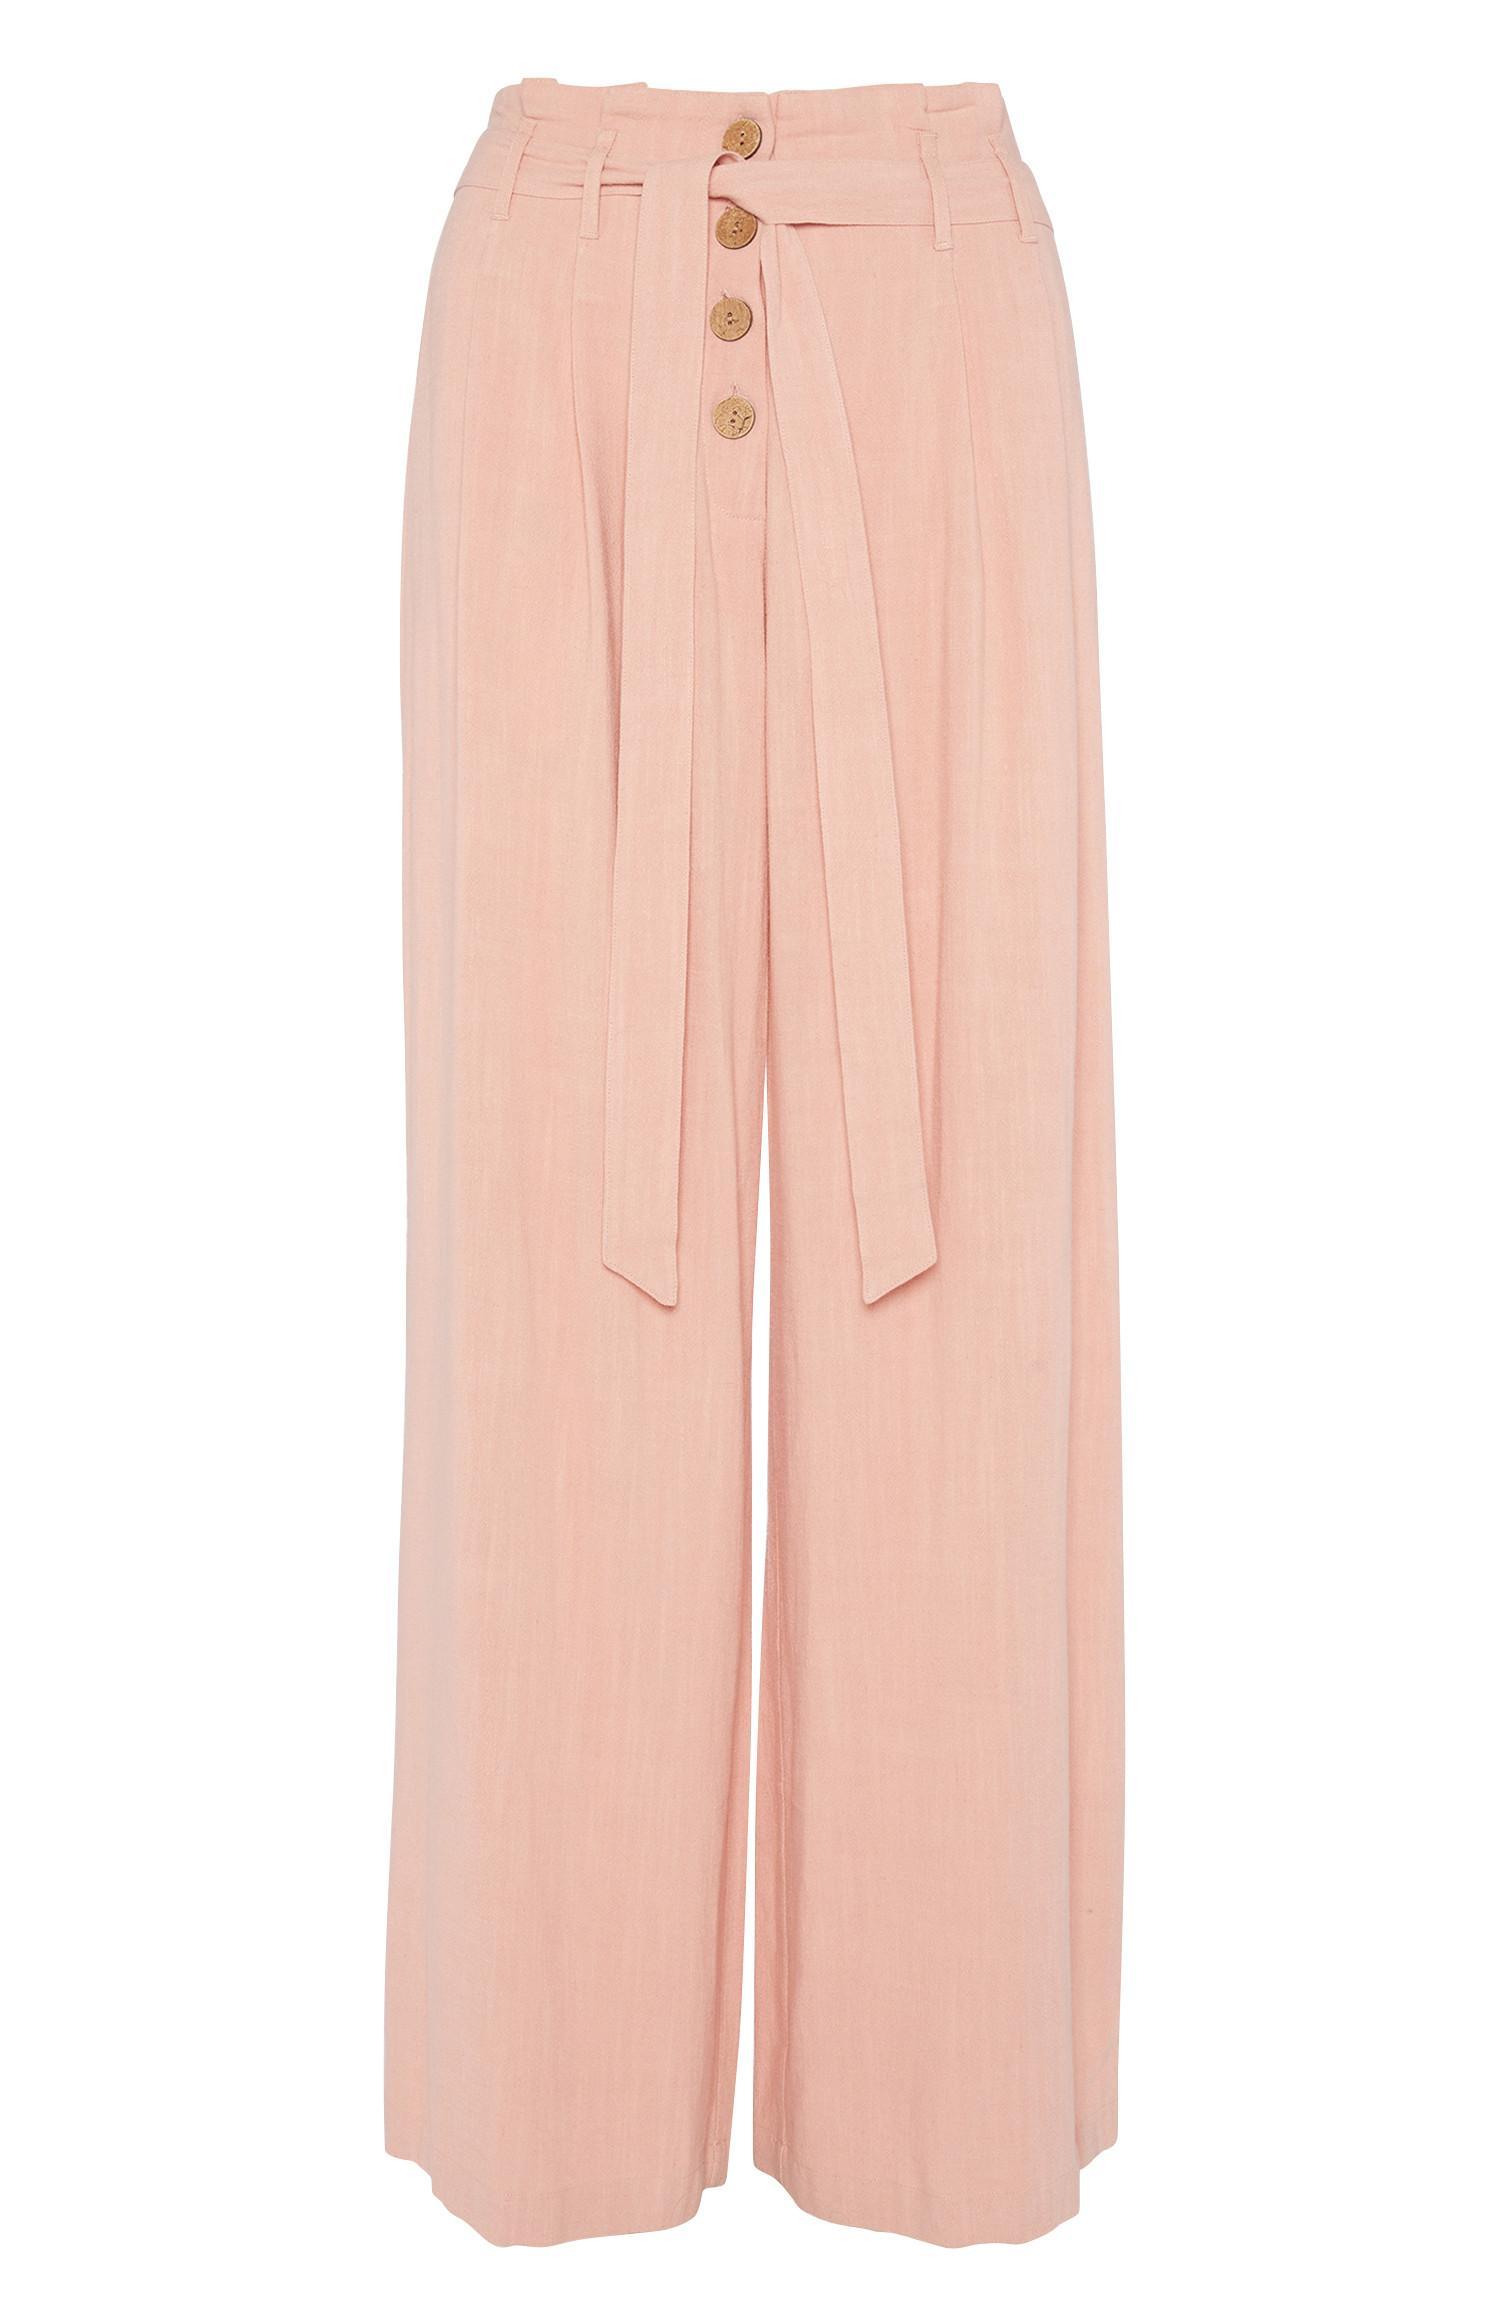 Pantalón de pata de elefante color rosa